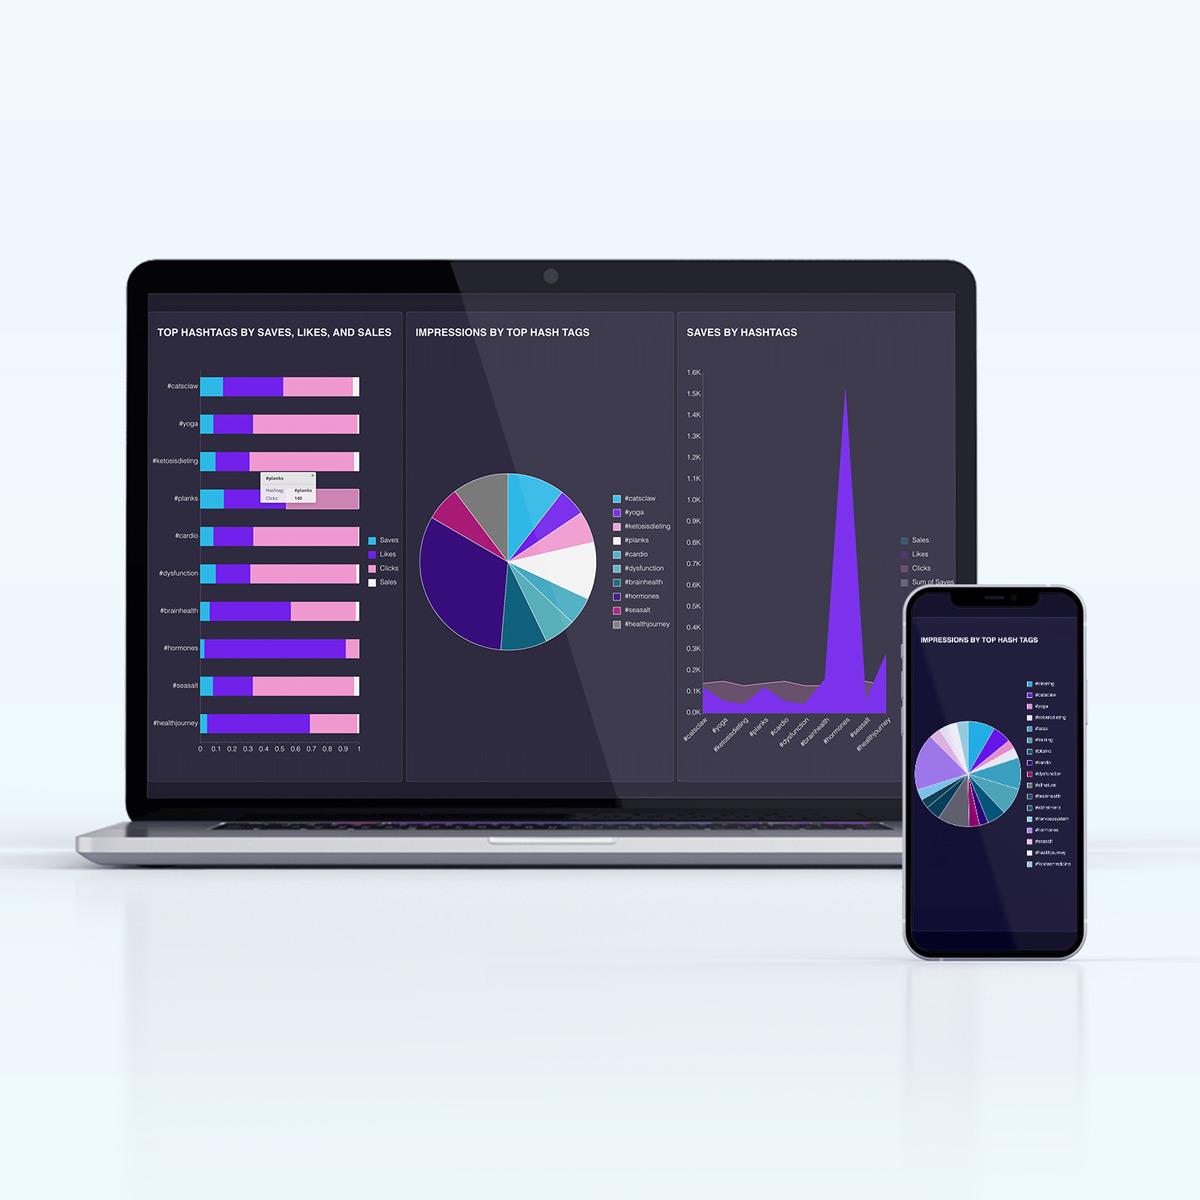 Business Intelligence Dashboard - Social Media Marketing Dashboard